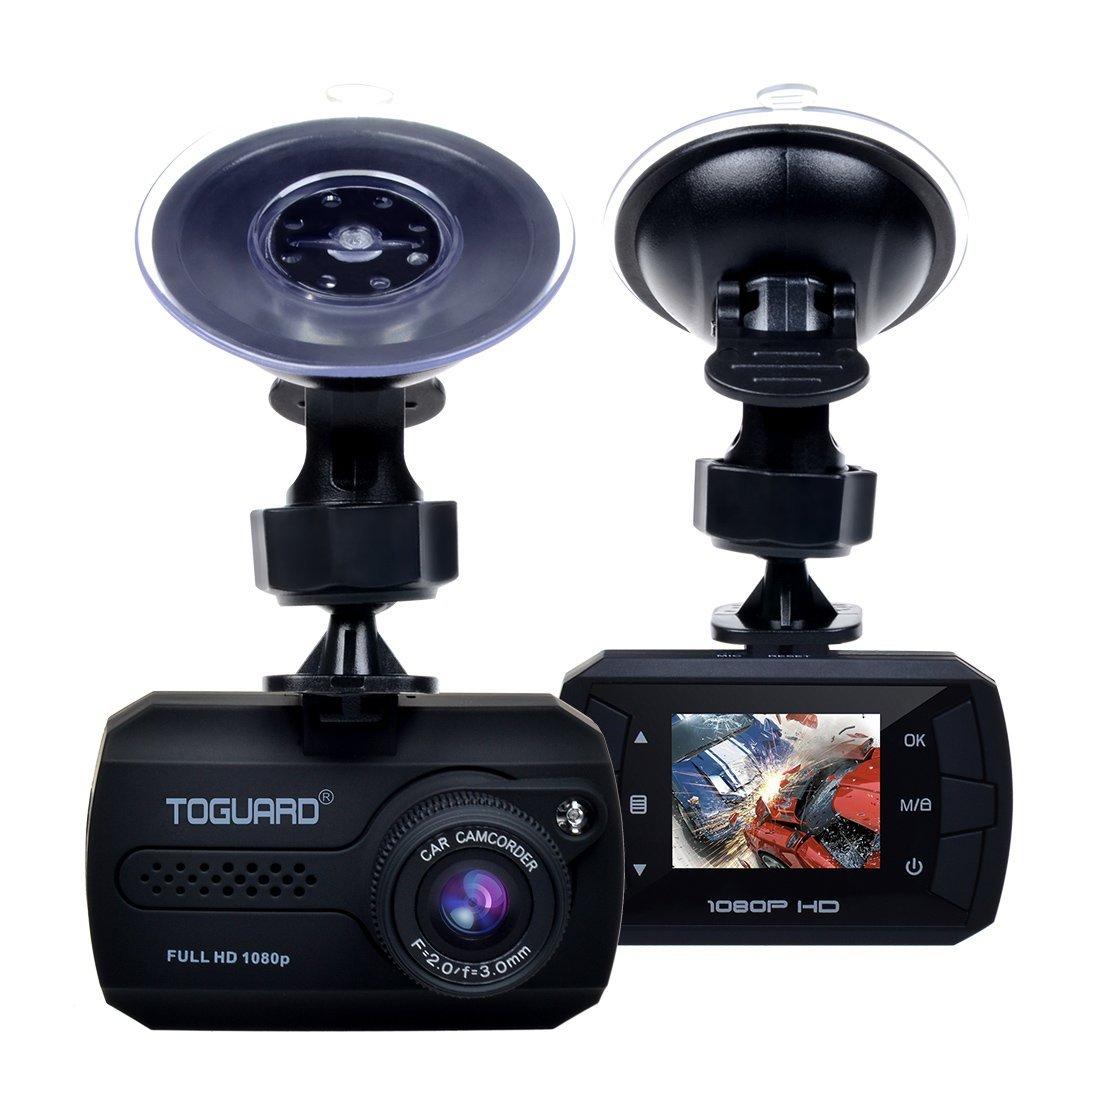 Mini Caméra Embarquée Grand Angle Toguard Dashcam CE680 pour Voitures - Full HD (Vendeur Tiers)